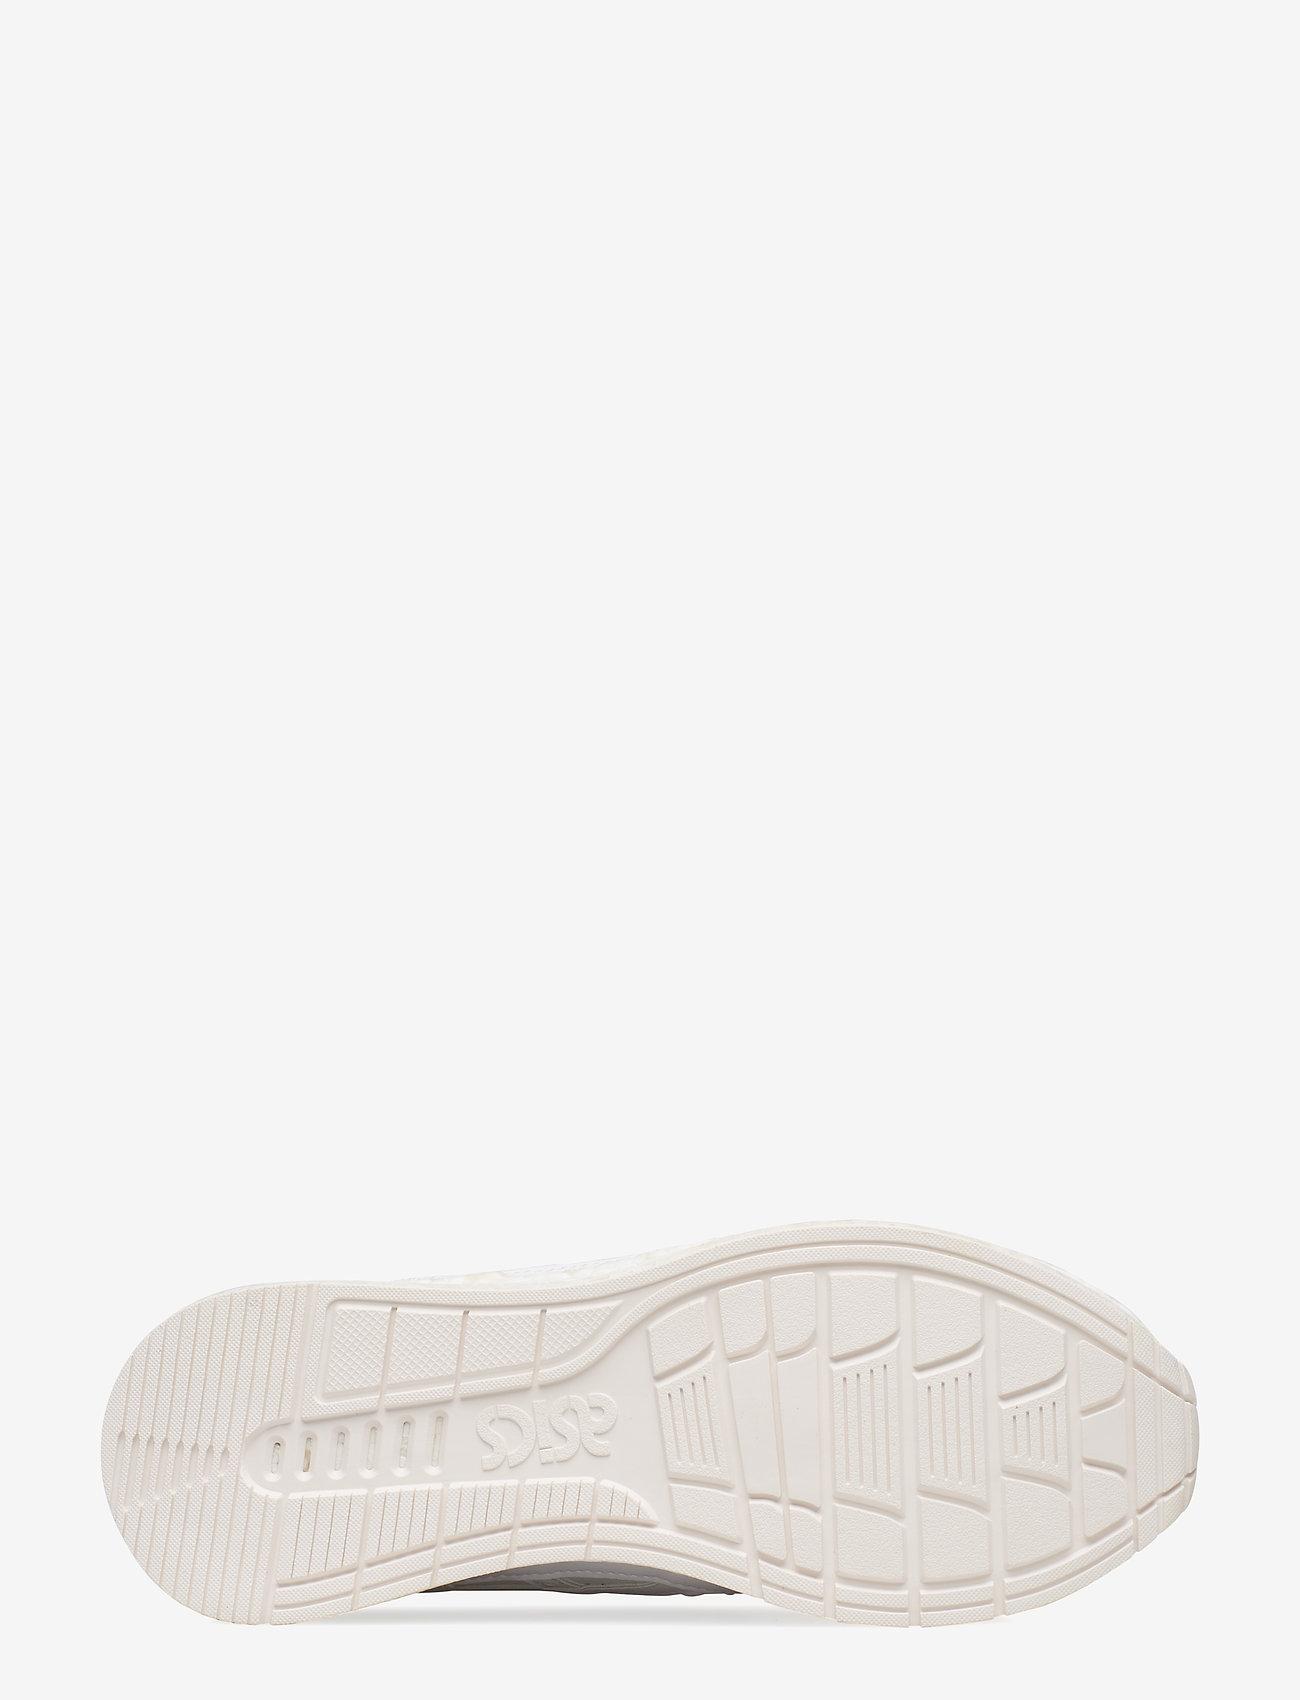 Hypergel-lyte (White/white) - ASICS SportStyle